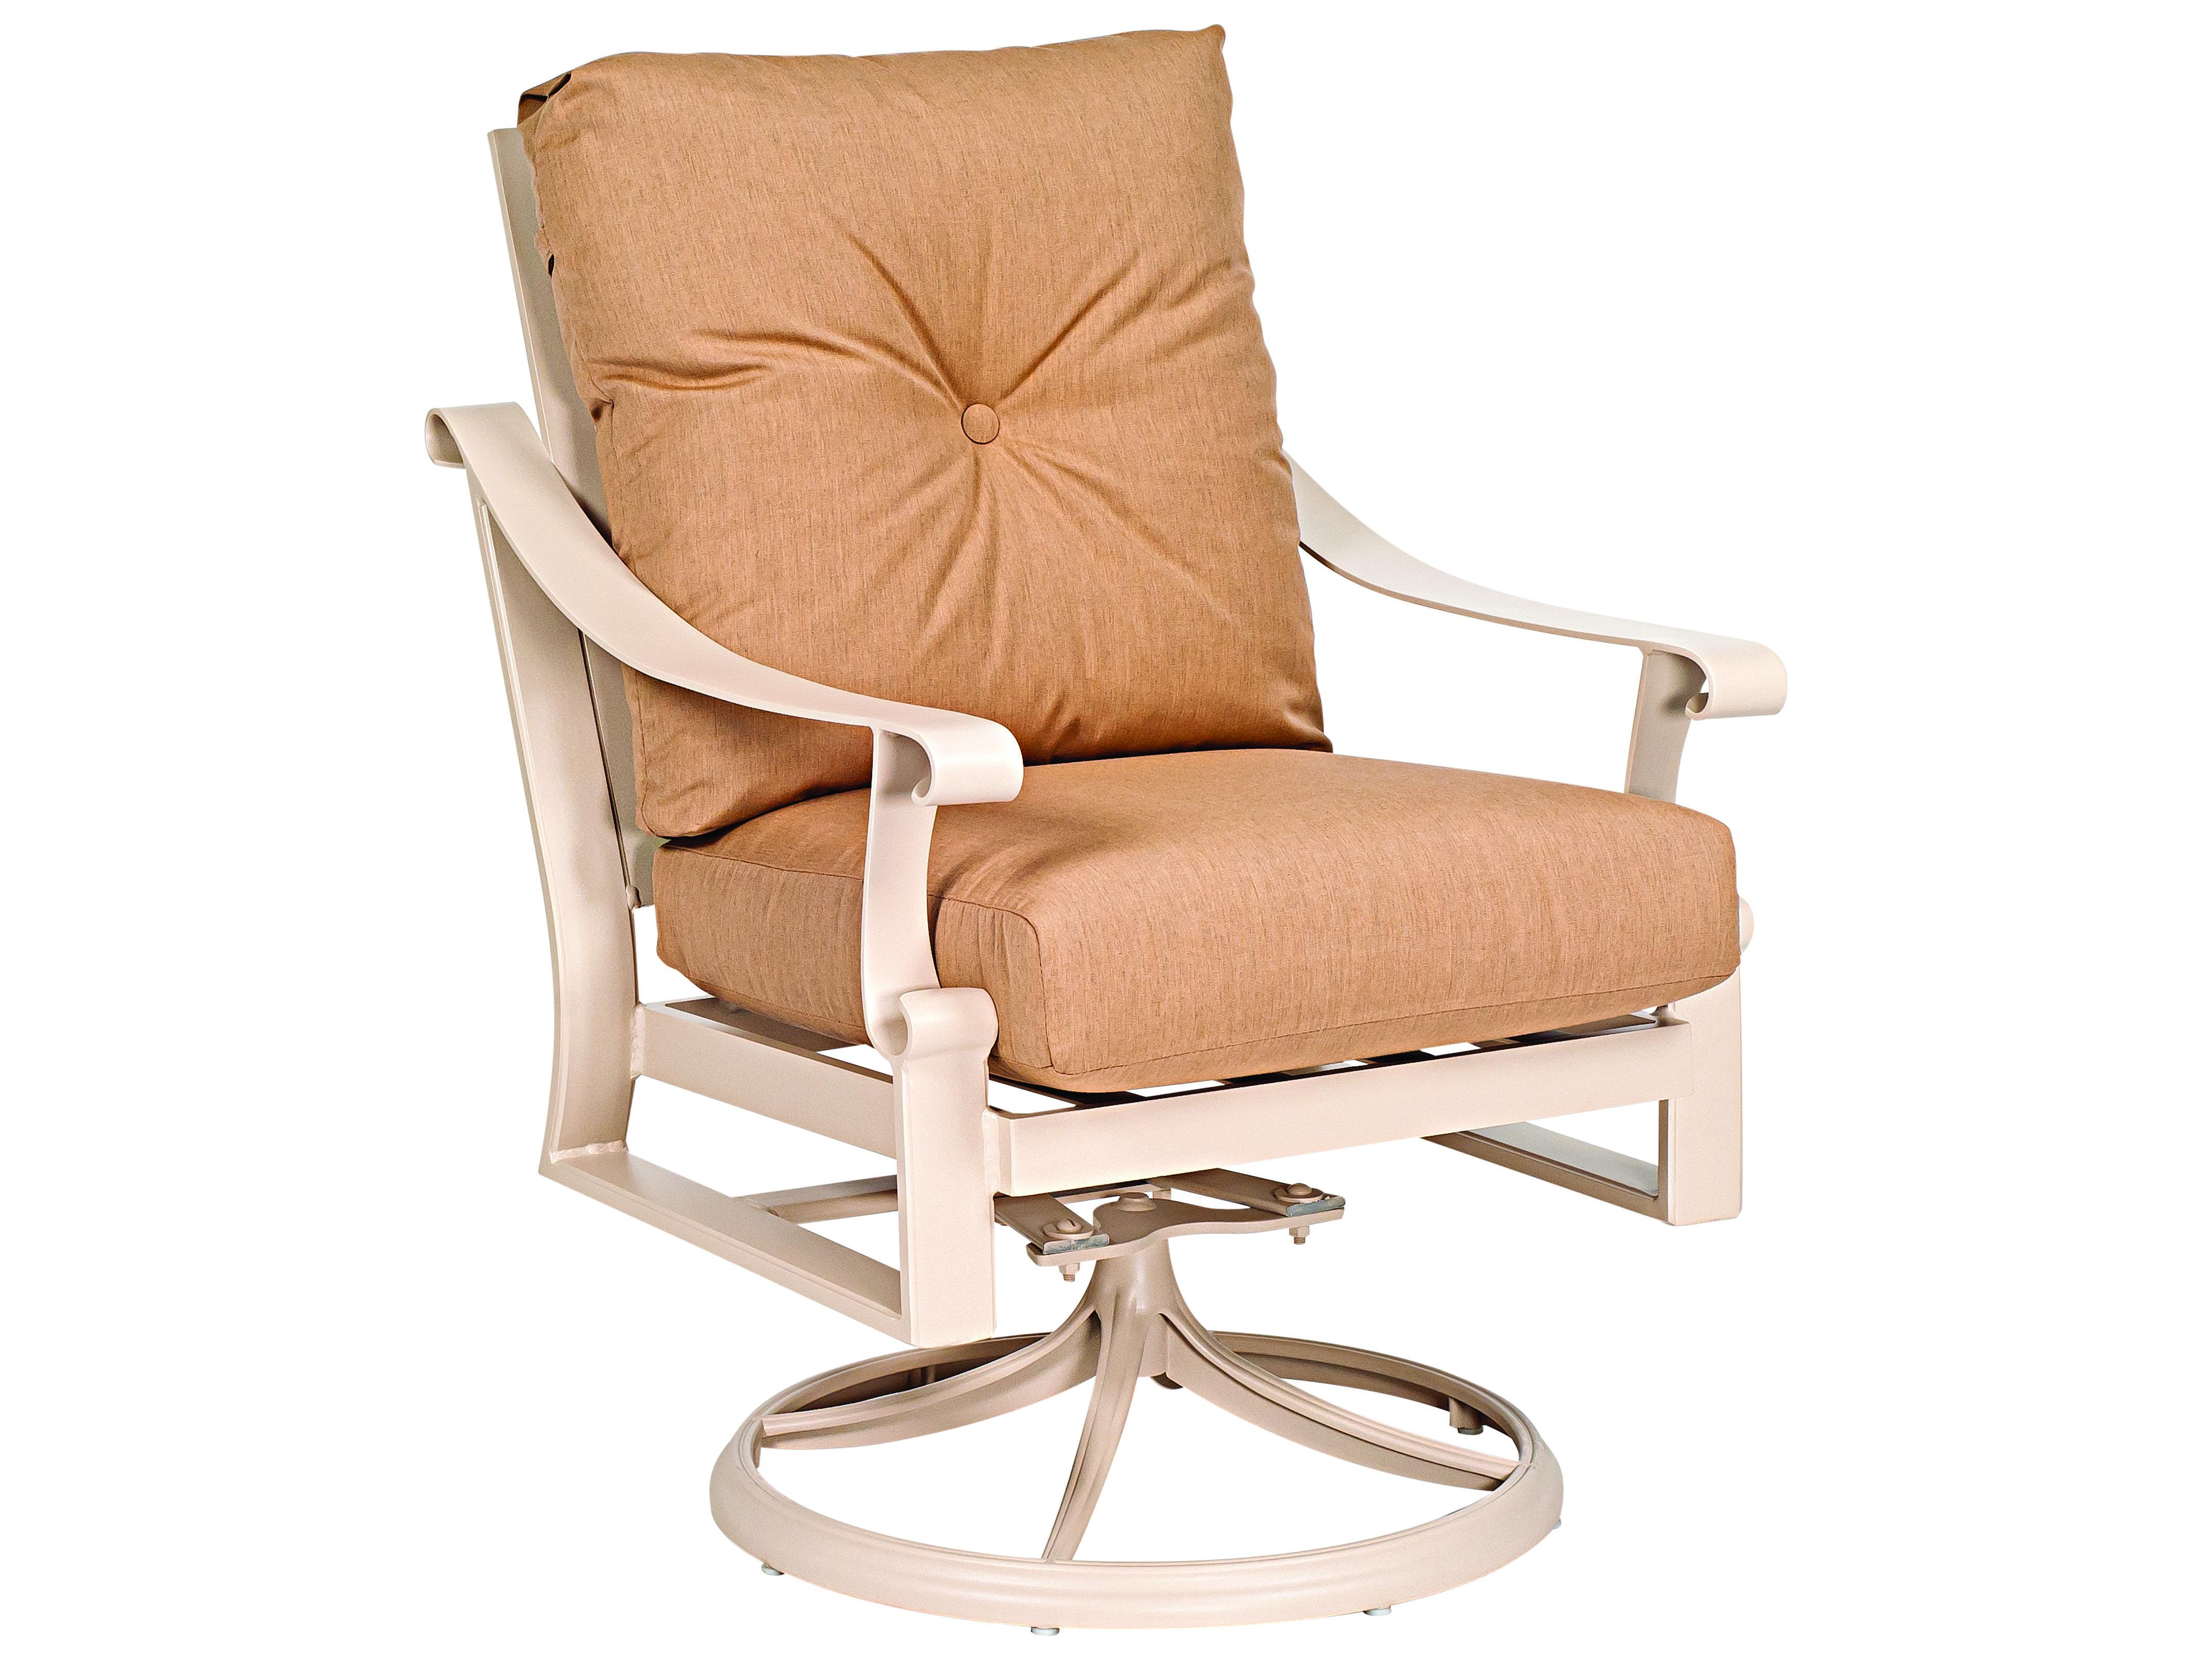 Woodard Bungalow Cushion Aluminum Swivel Rocker Lounge